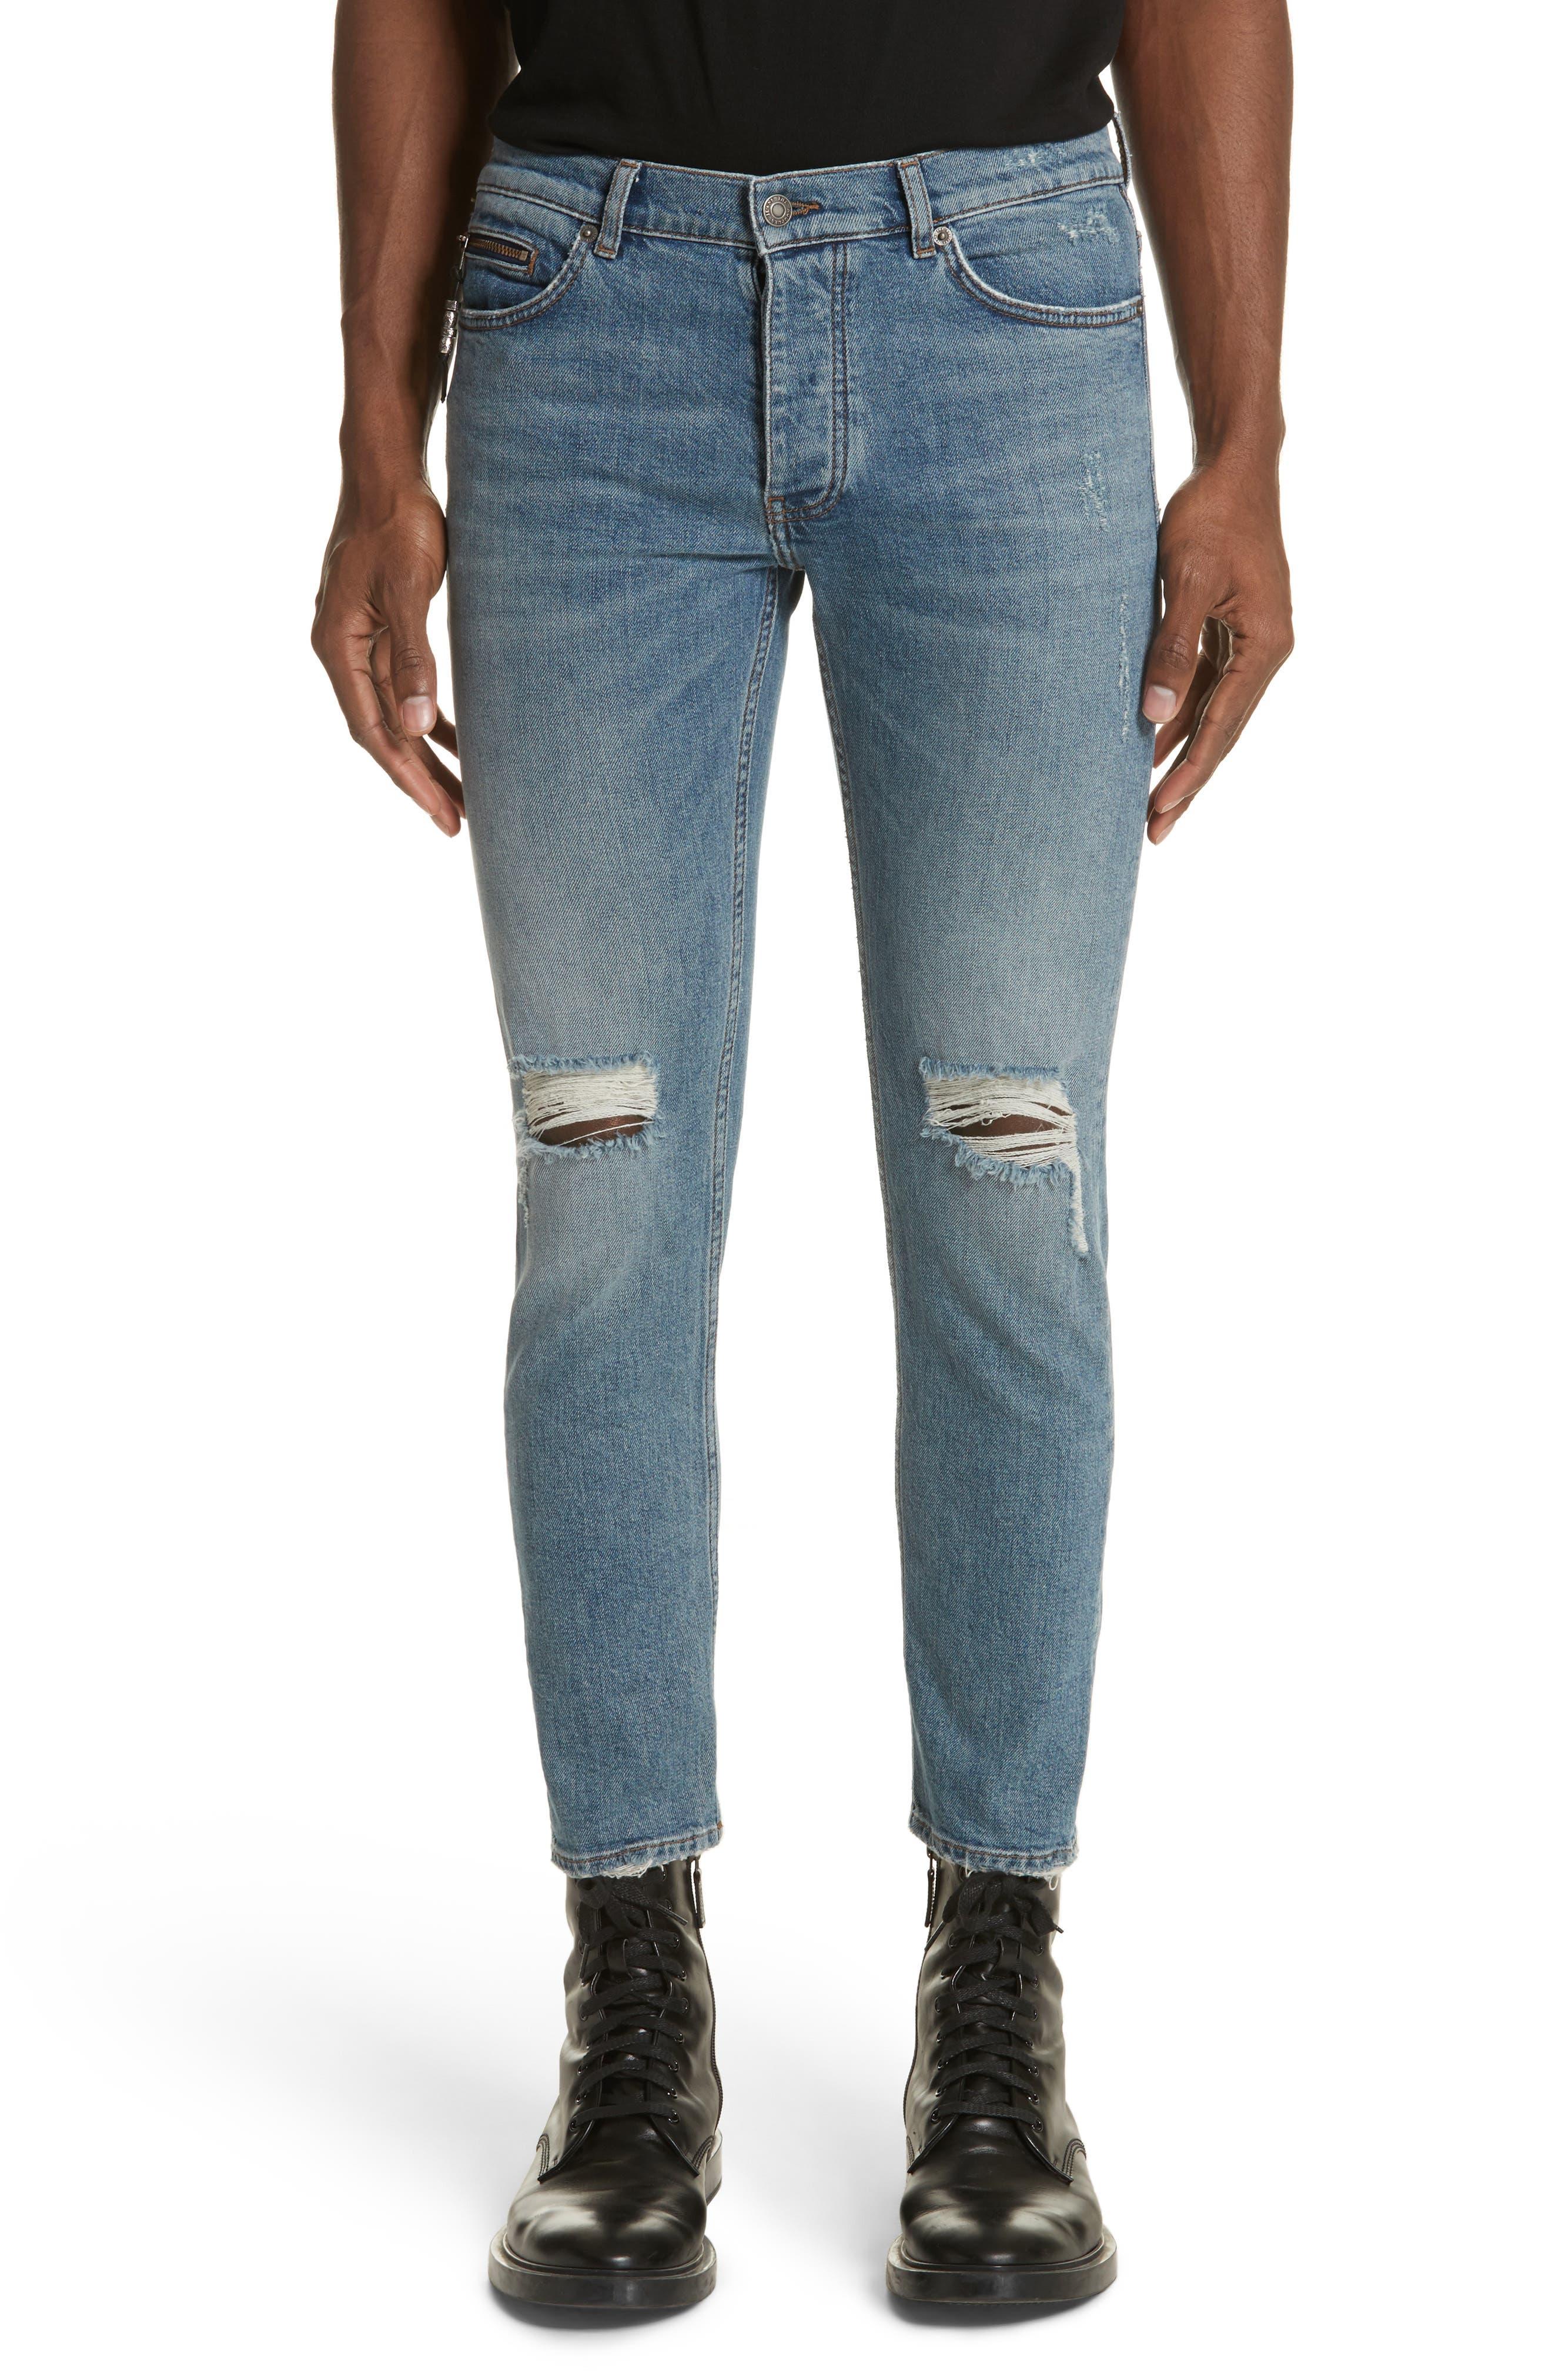 The Kooples Destroyed Skinny Fit Jeans